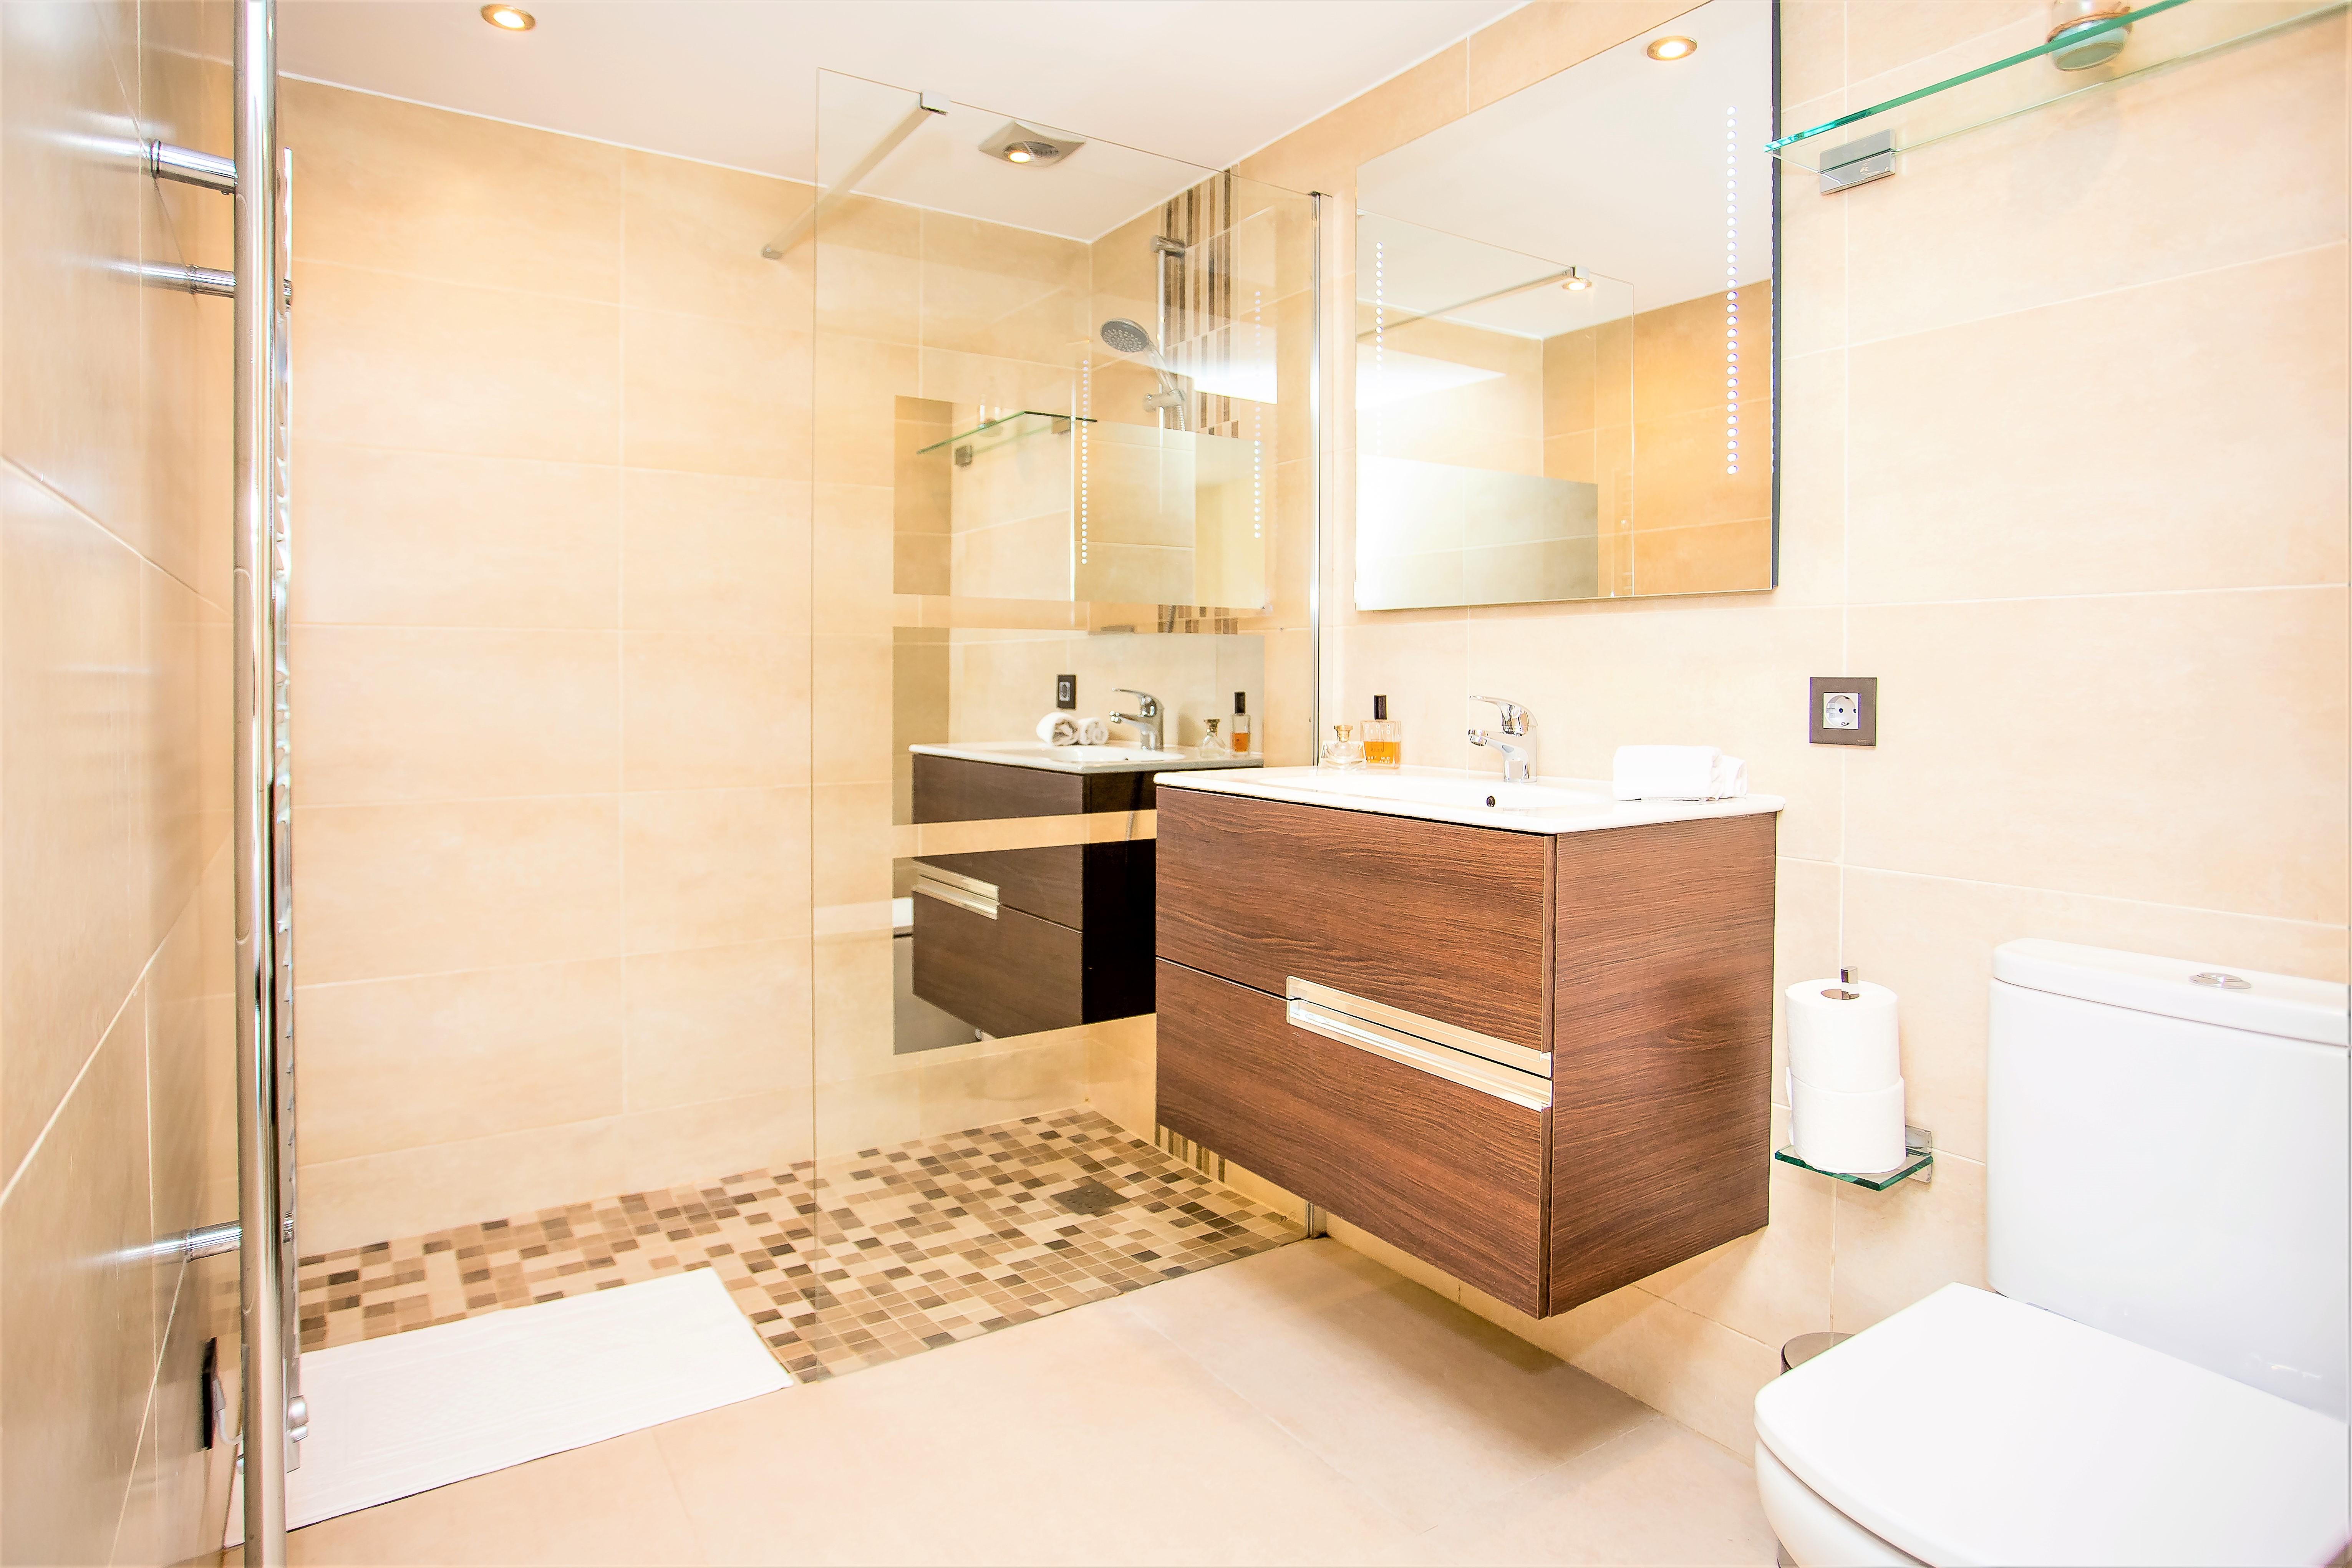 Apartment 4 B R  VILLA by Puerto Banus   Sea 5 m                                photo 20341560